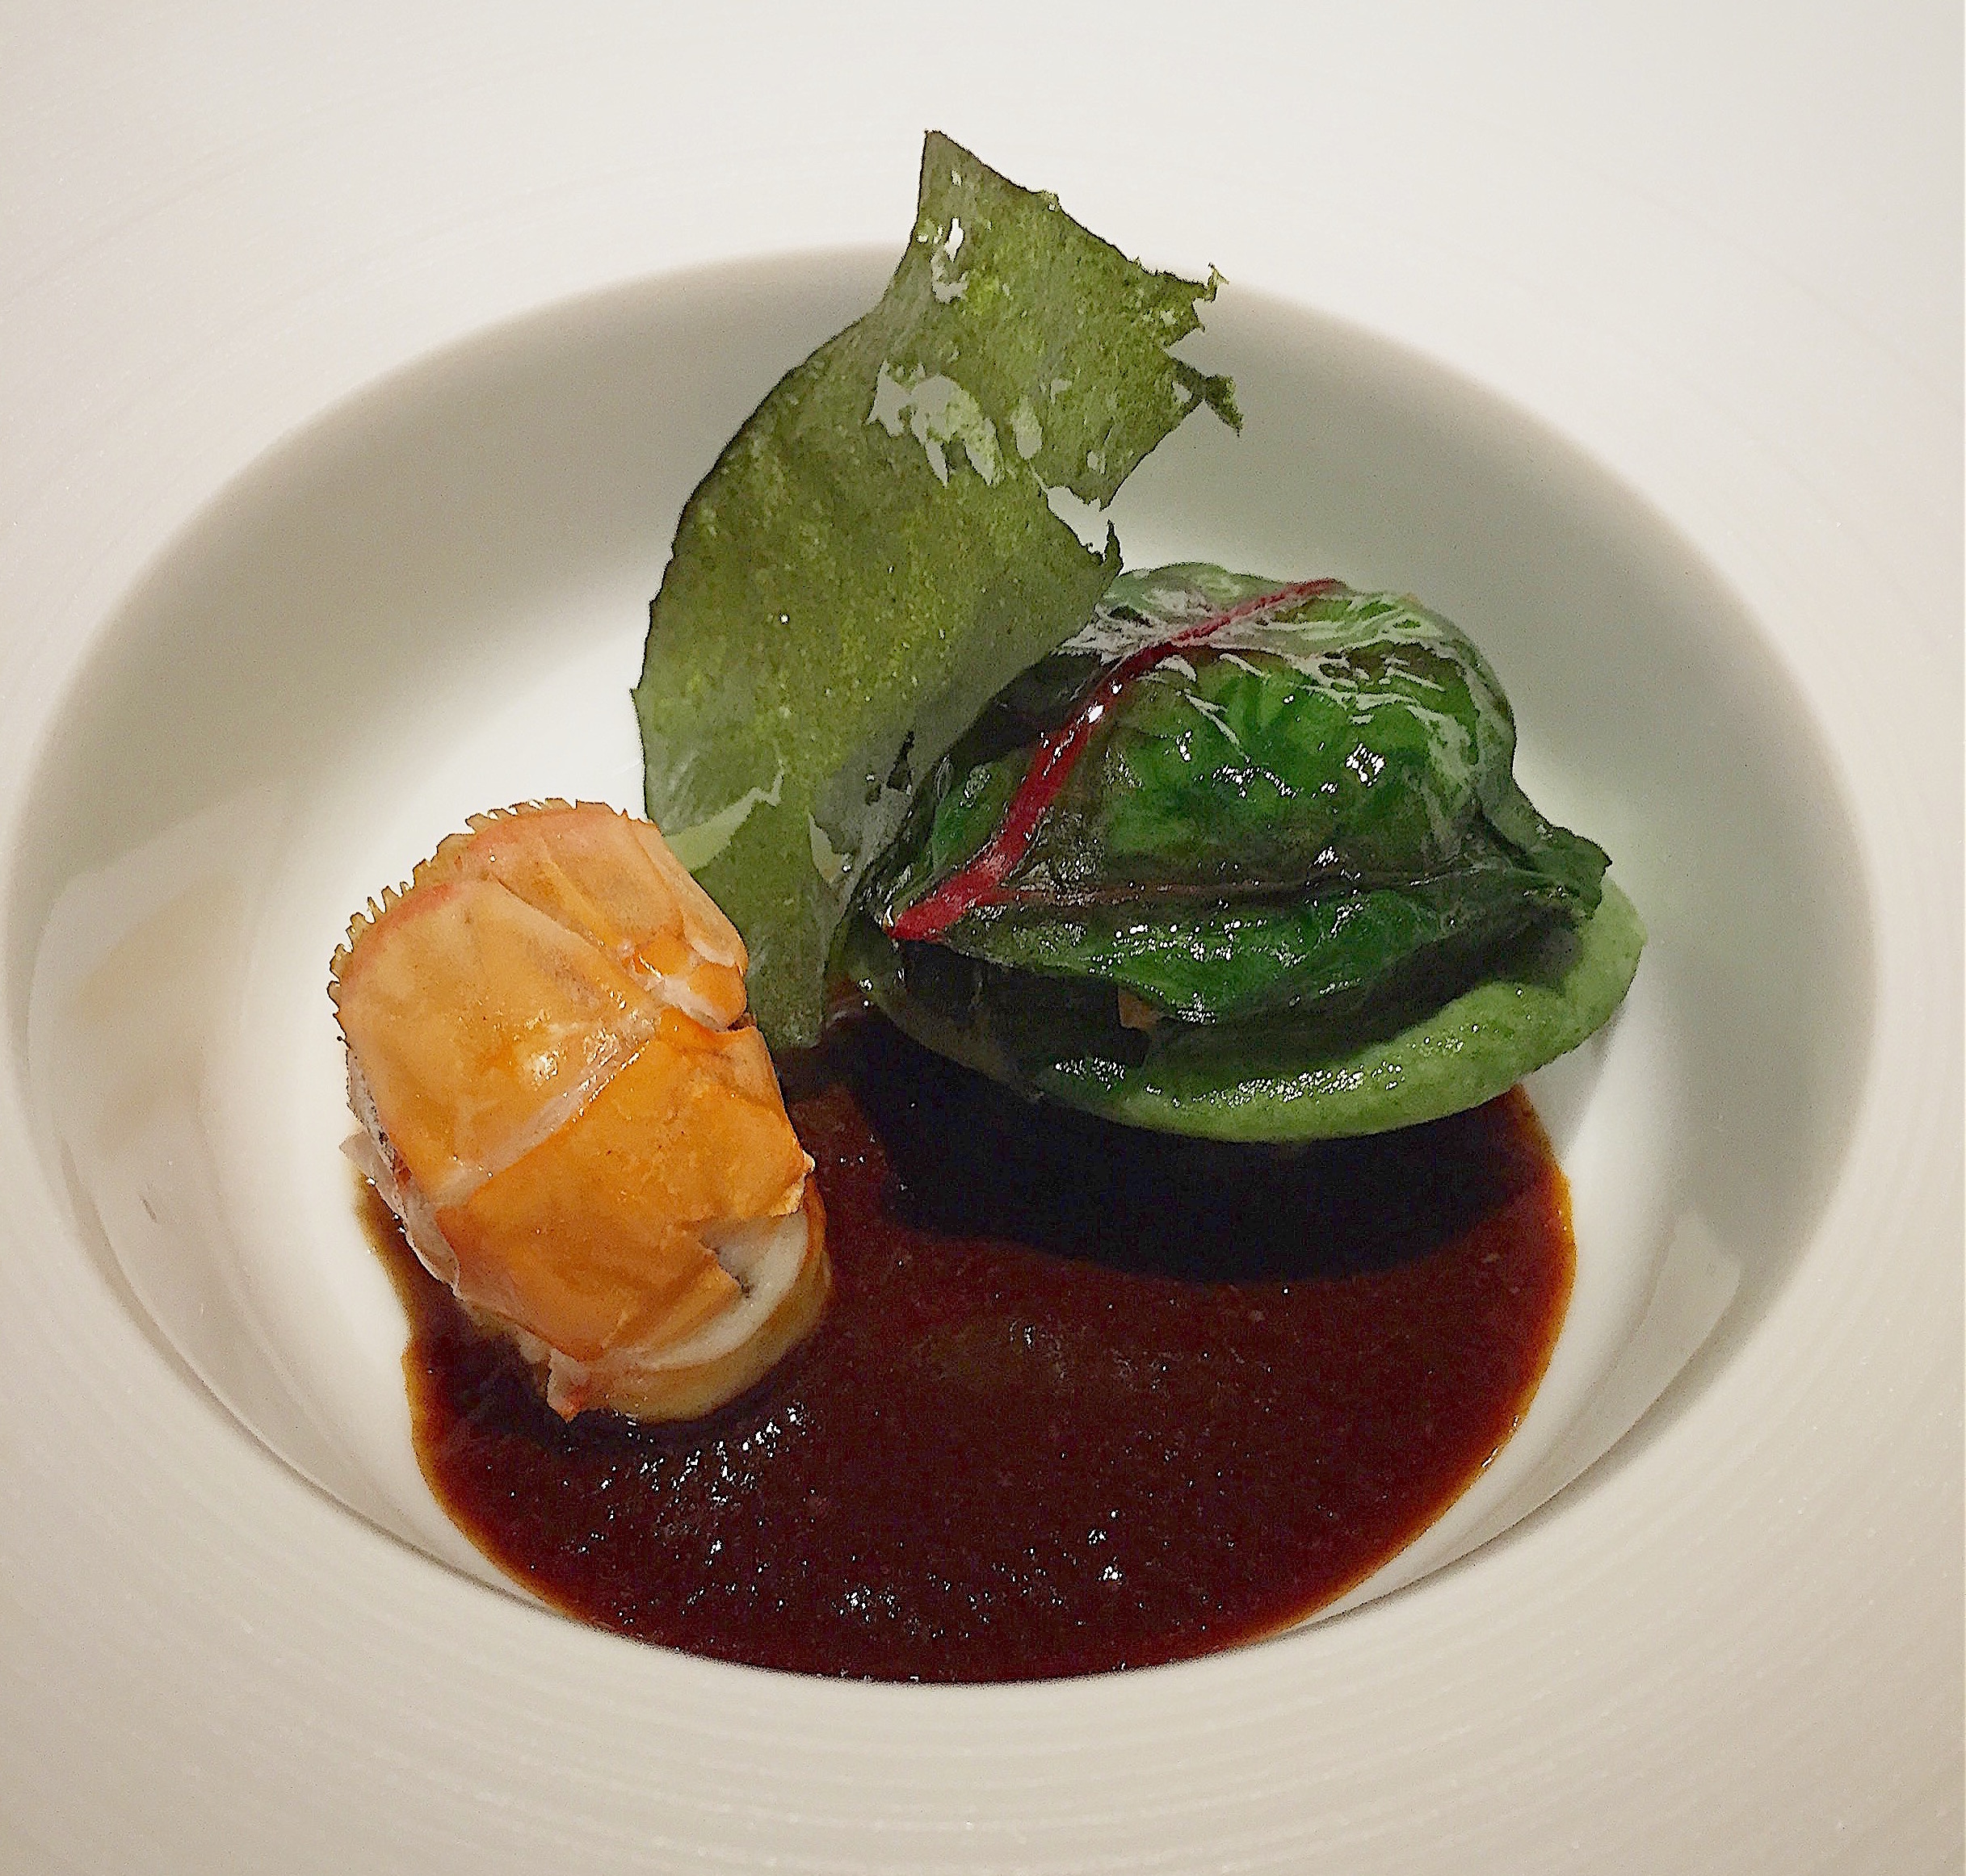 Restaurant Alain Geaam - Langoustine, langoustine ravioli, langoustine sauce @Alexander Lobrano